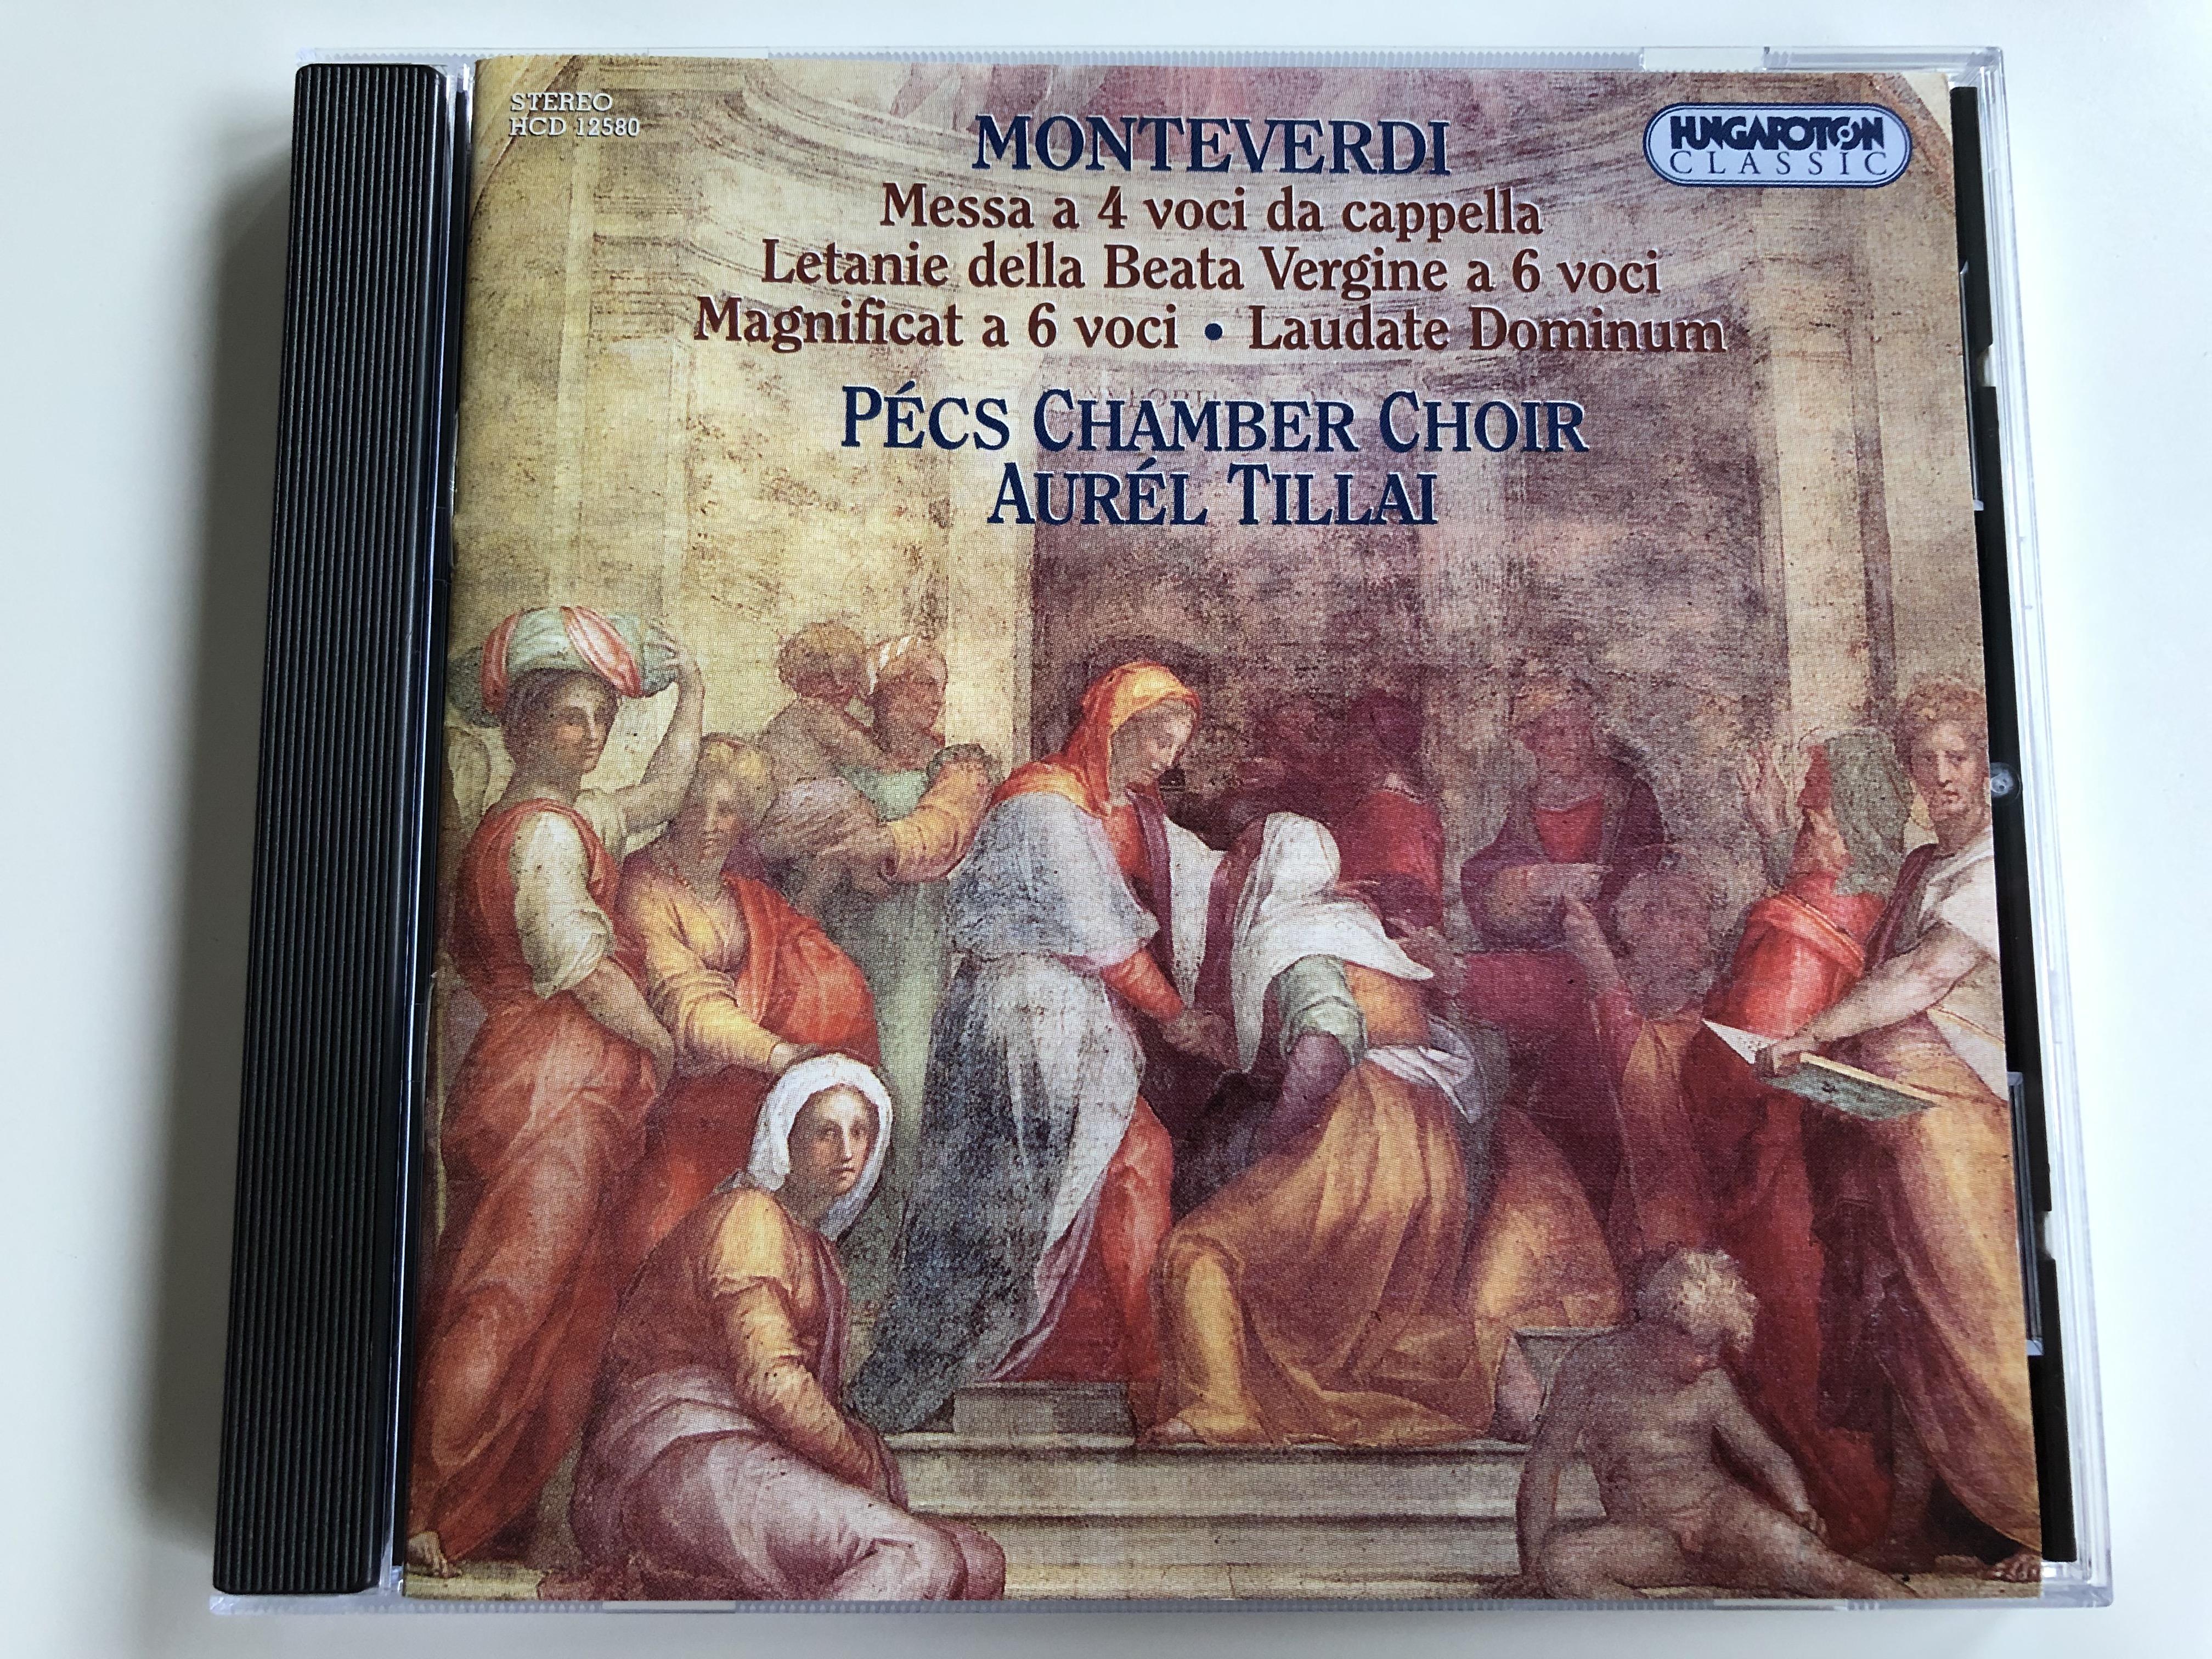 monteverdi-messa-a-4-voci-da-cappella-letanie-della-beata-vergine-a-6-voci-magnificat-a-6-voci-laudate-dominum-p-cs-chamber-choir-aur-l-tillai-hungaroton-classic-audio-cd-1980-stereo-hcd-1-.jpg